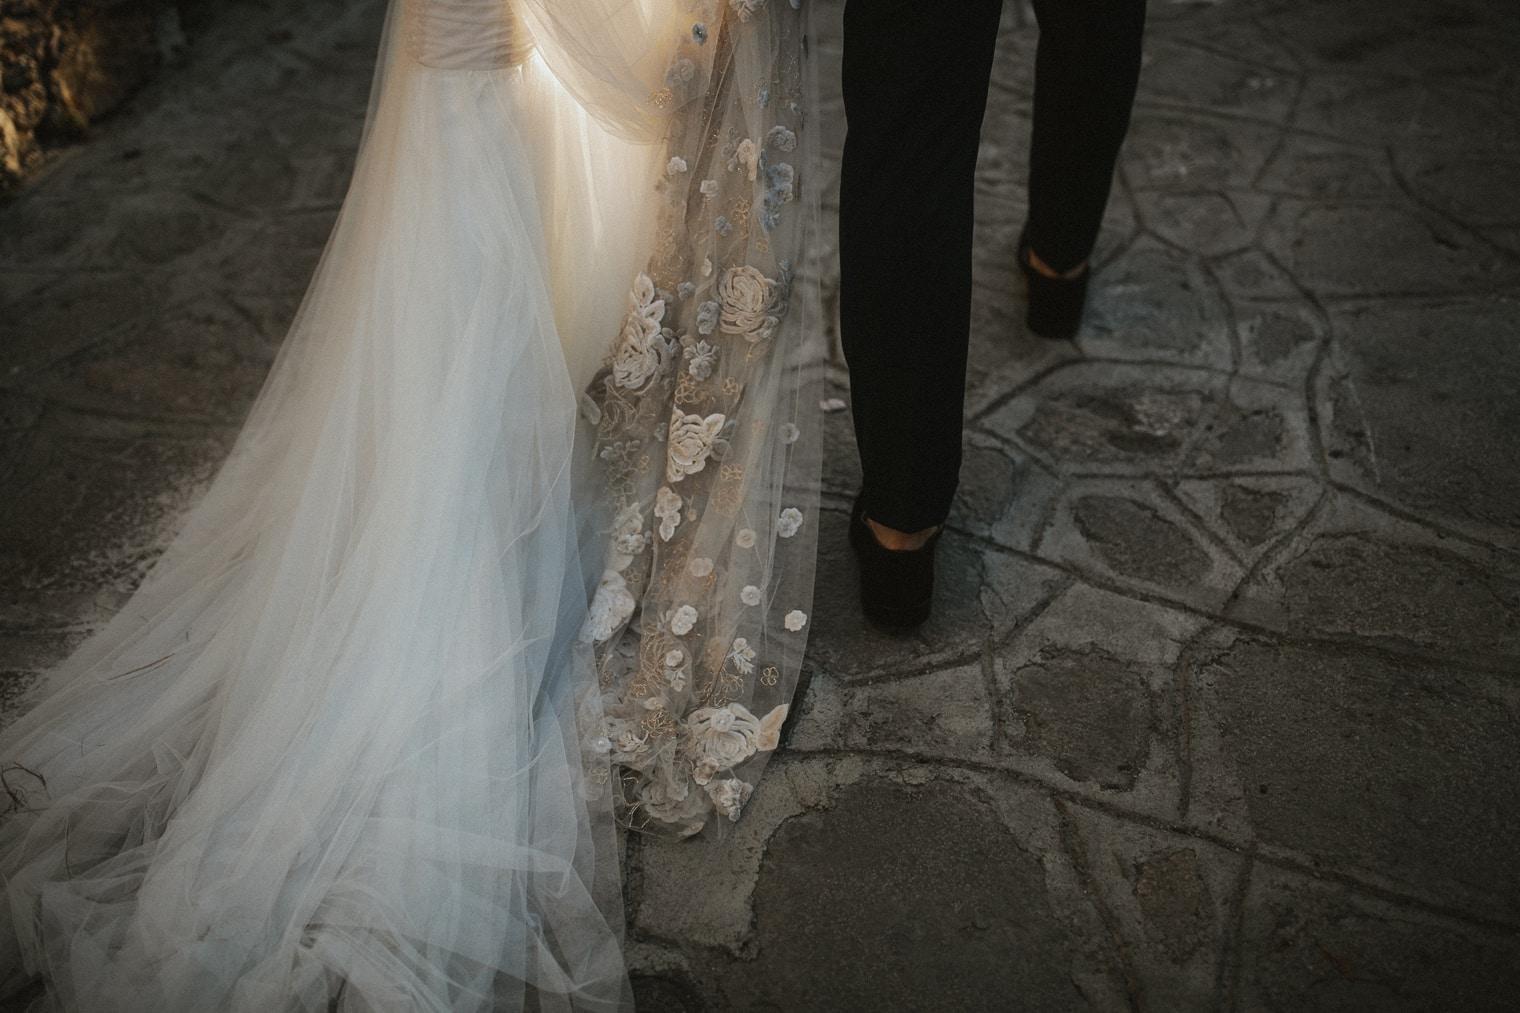 Jenny packham bespoke wedding dress